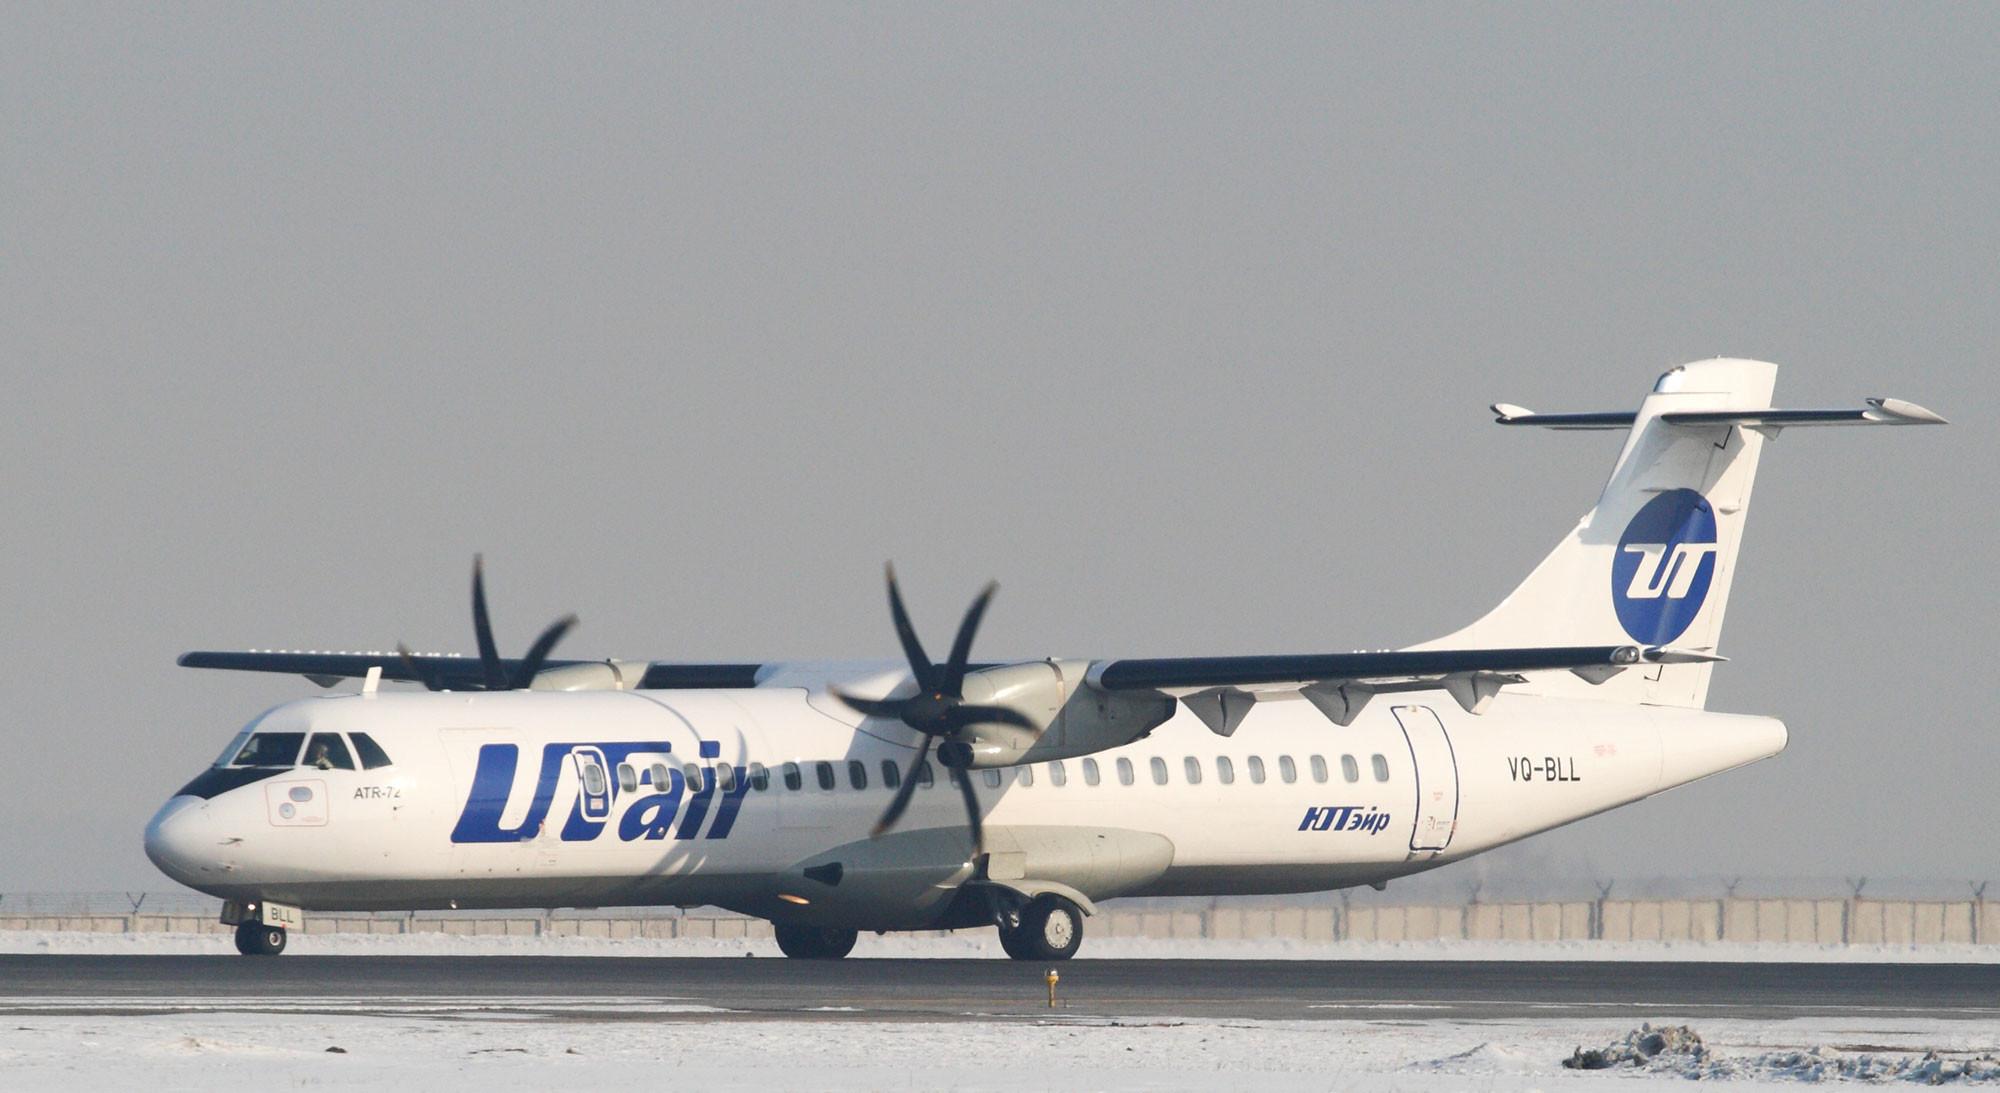 Самолёт ATR-72 компании UTair перед взлётом в аэропорту. Фото: © РИА Новости